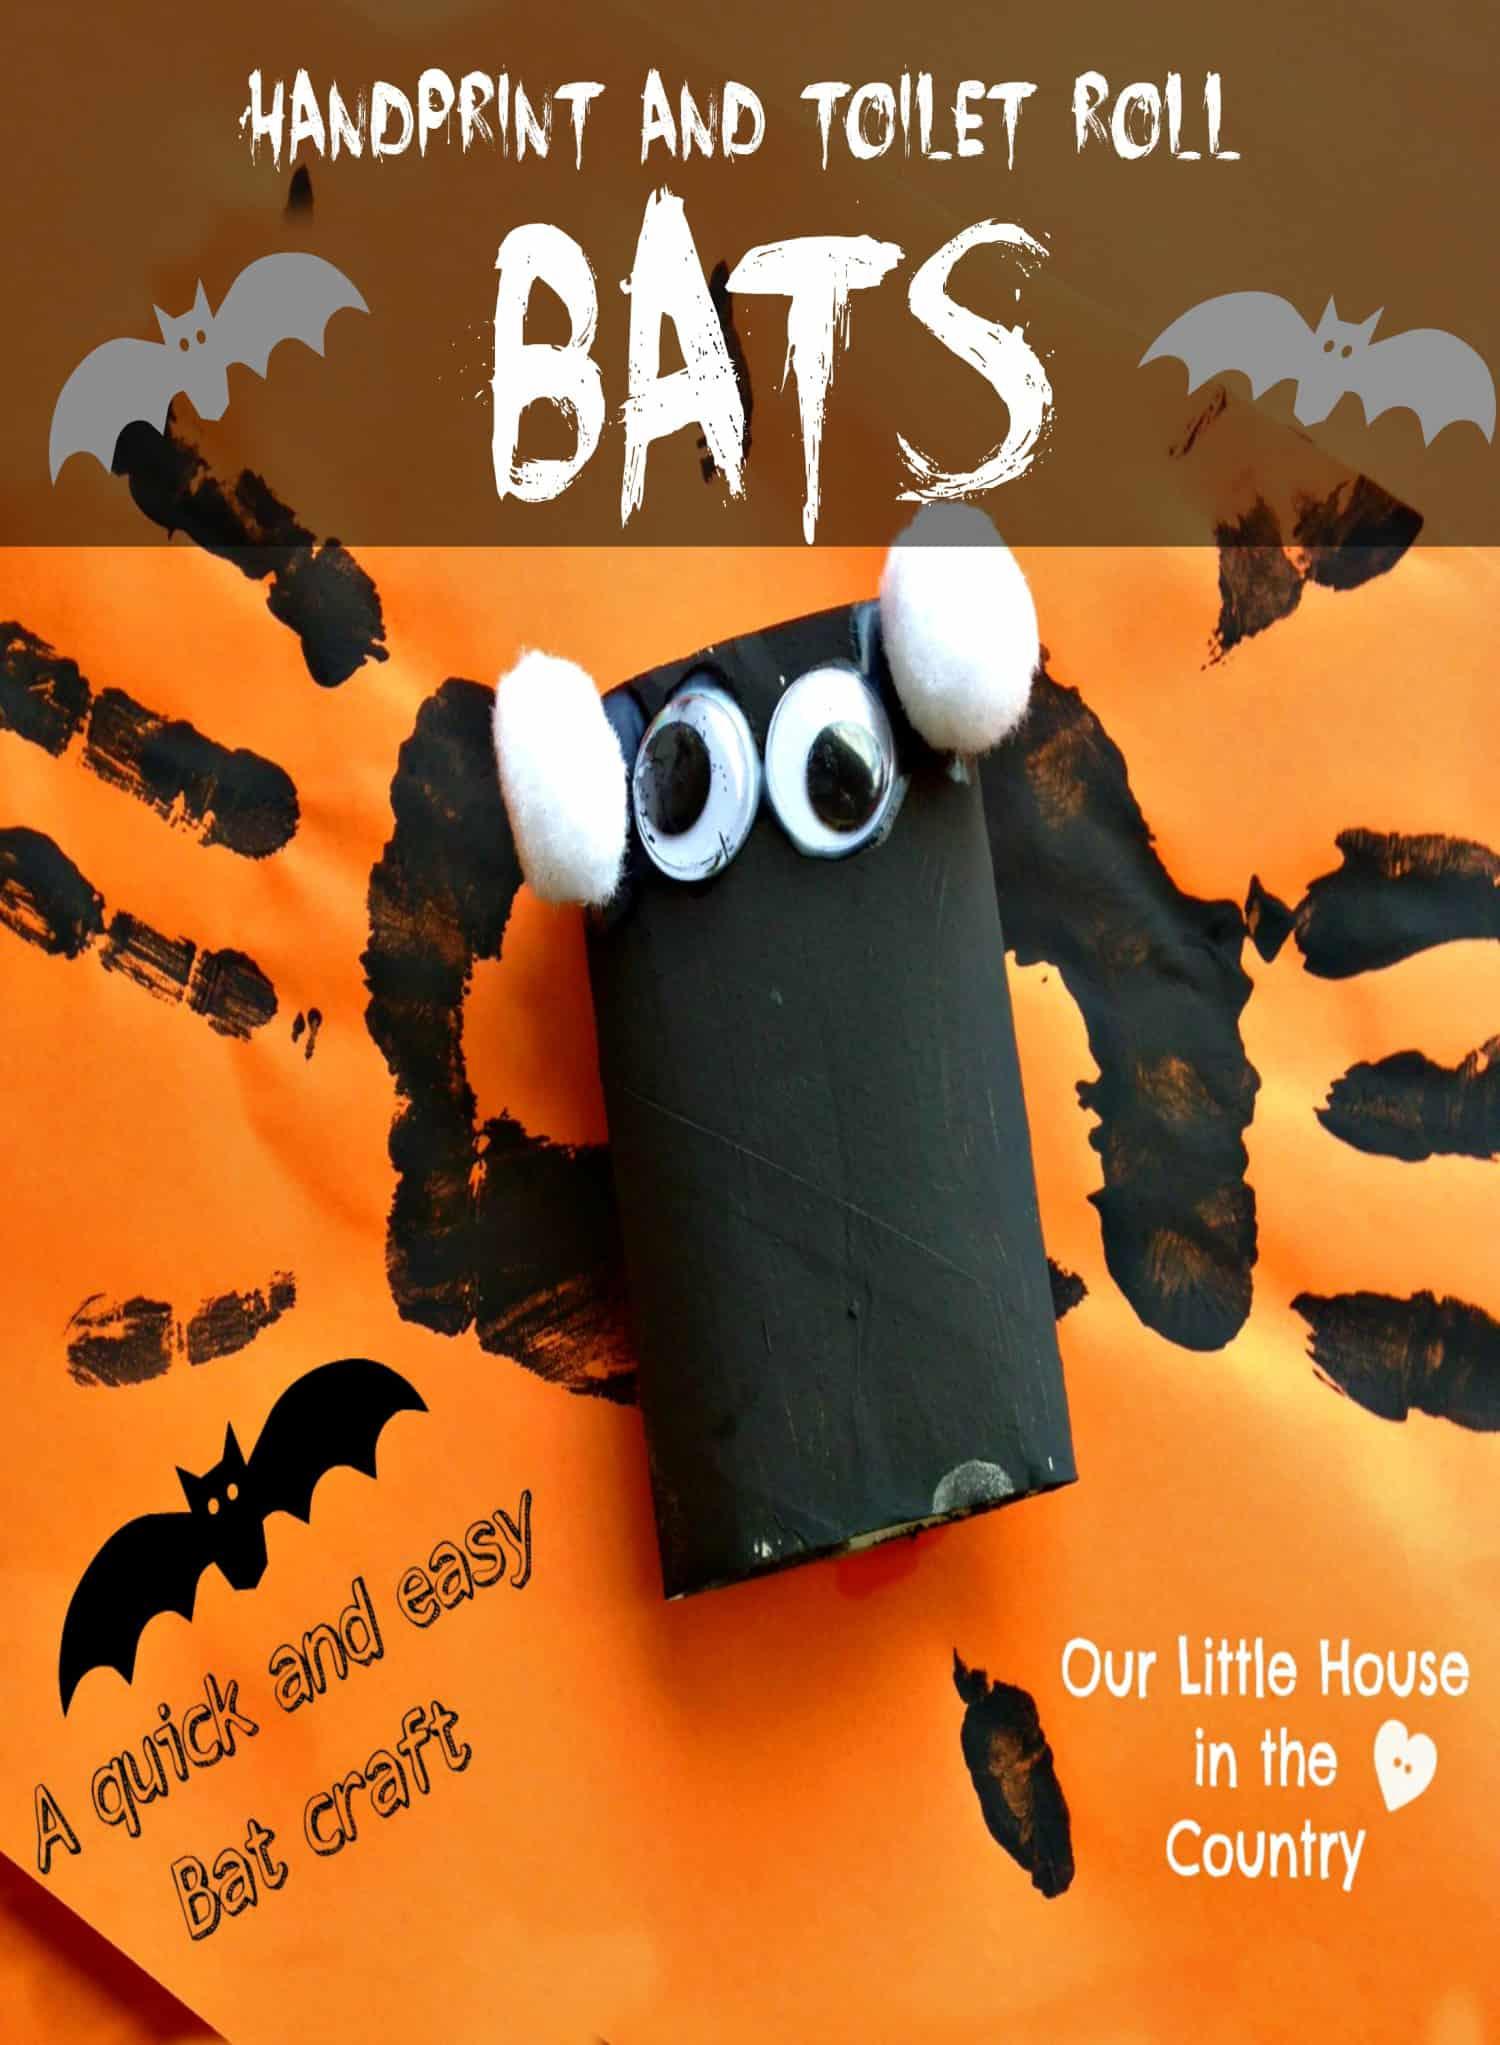 Handprint and toilet roll bats